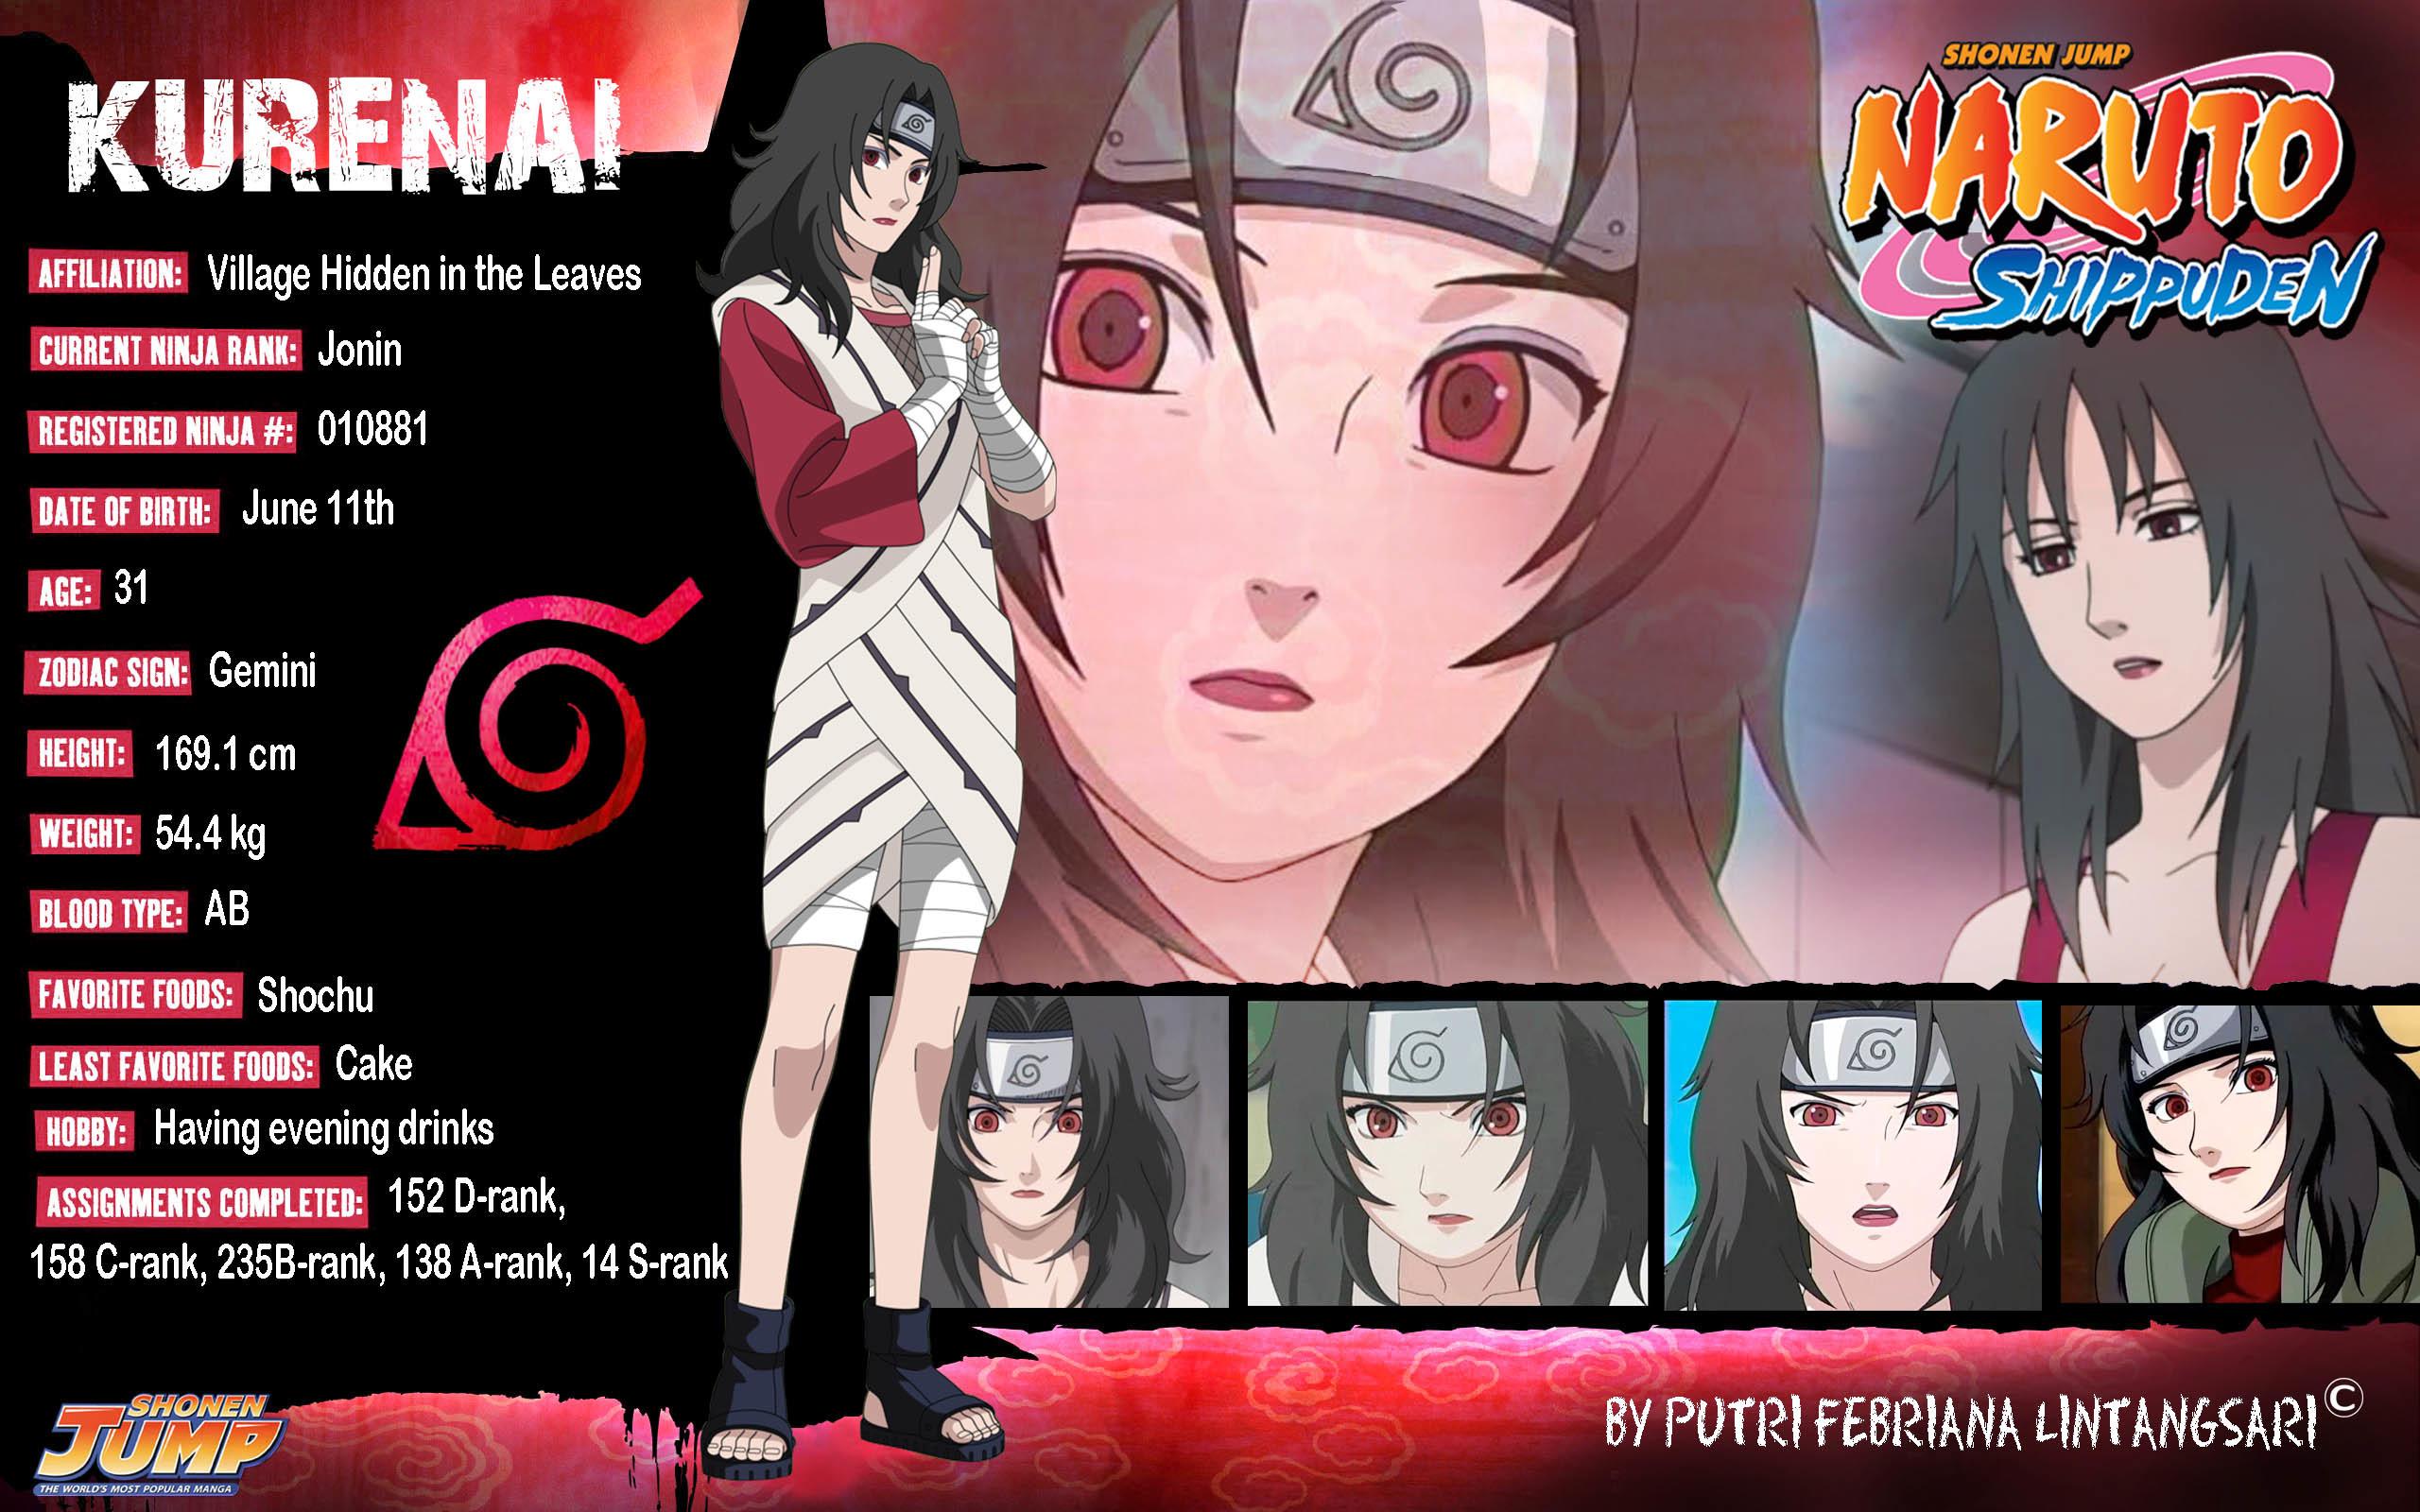 Res: 2560x1600, She is also the leader of Team Kurenai, which consists of: Hinata Hyūga,  Shino Aburame, Kiba Inuzuka and Akamaru.